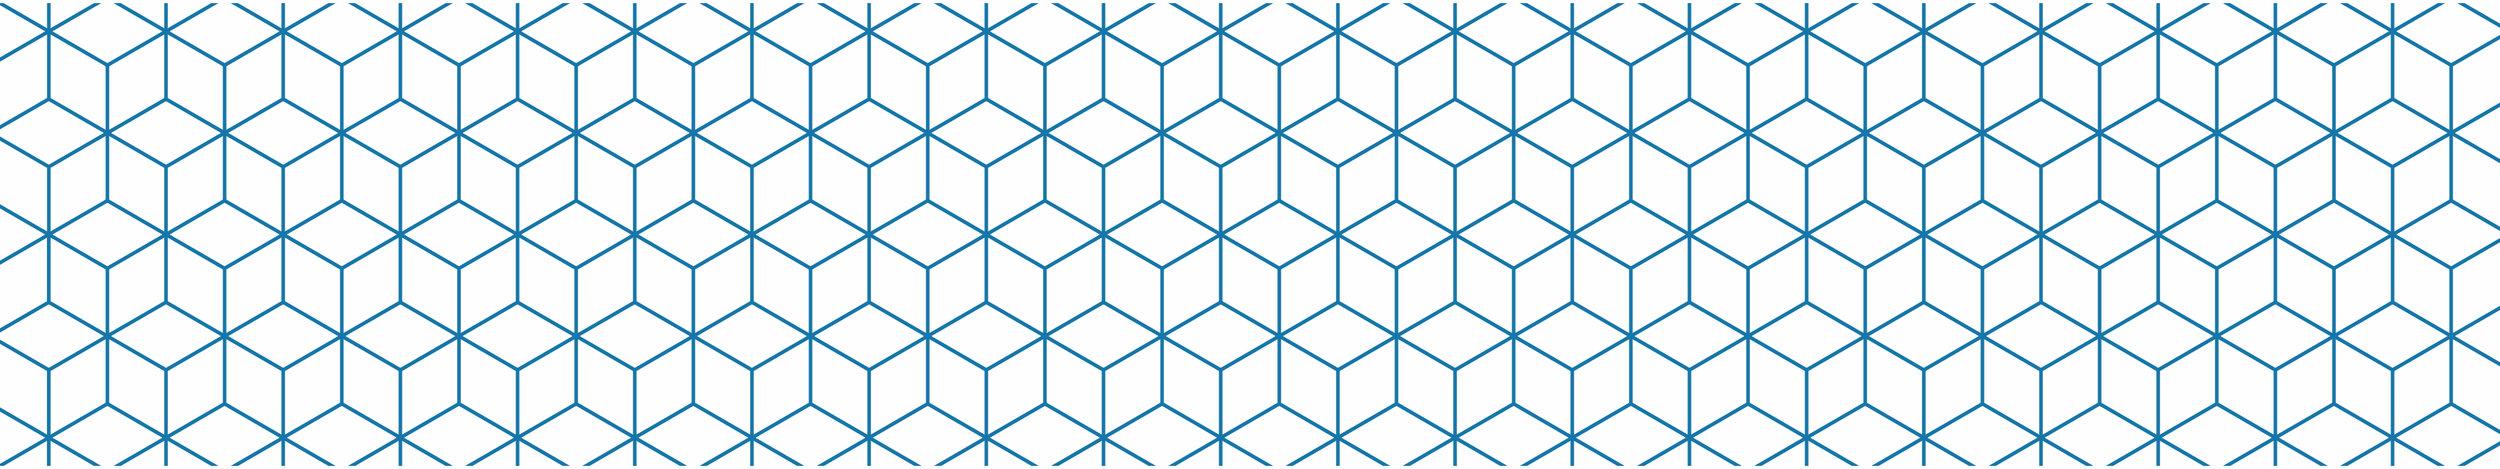 coa-pattern_01@2x.jpg